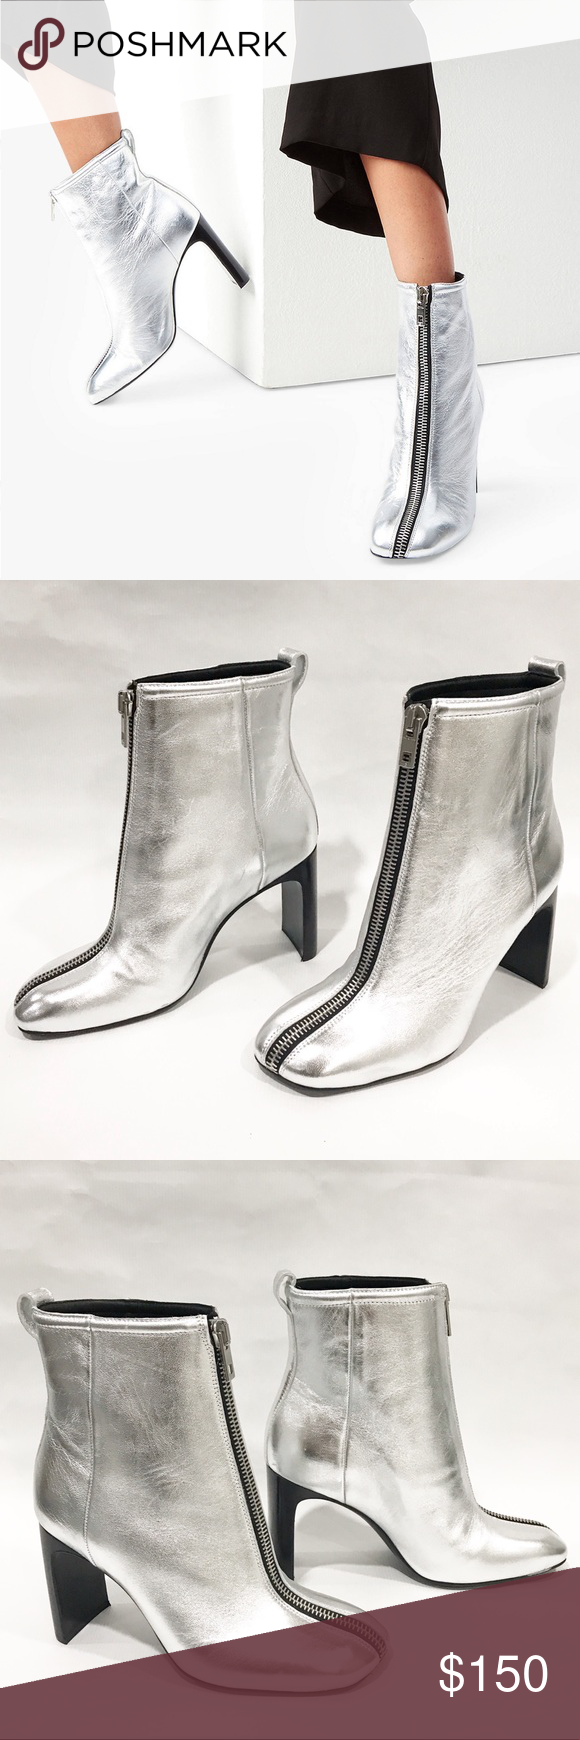 New rag & bone Ellis Front Zip Ankle Boots Silver NWOT rag & bone Ellis Front Zi…